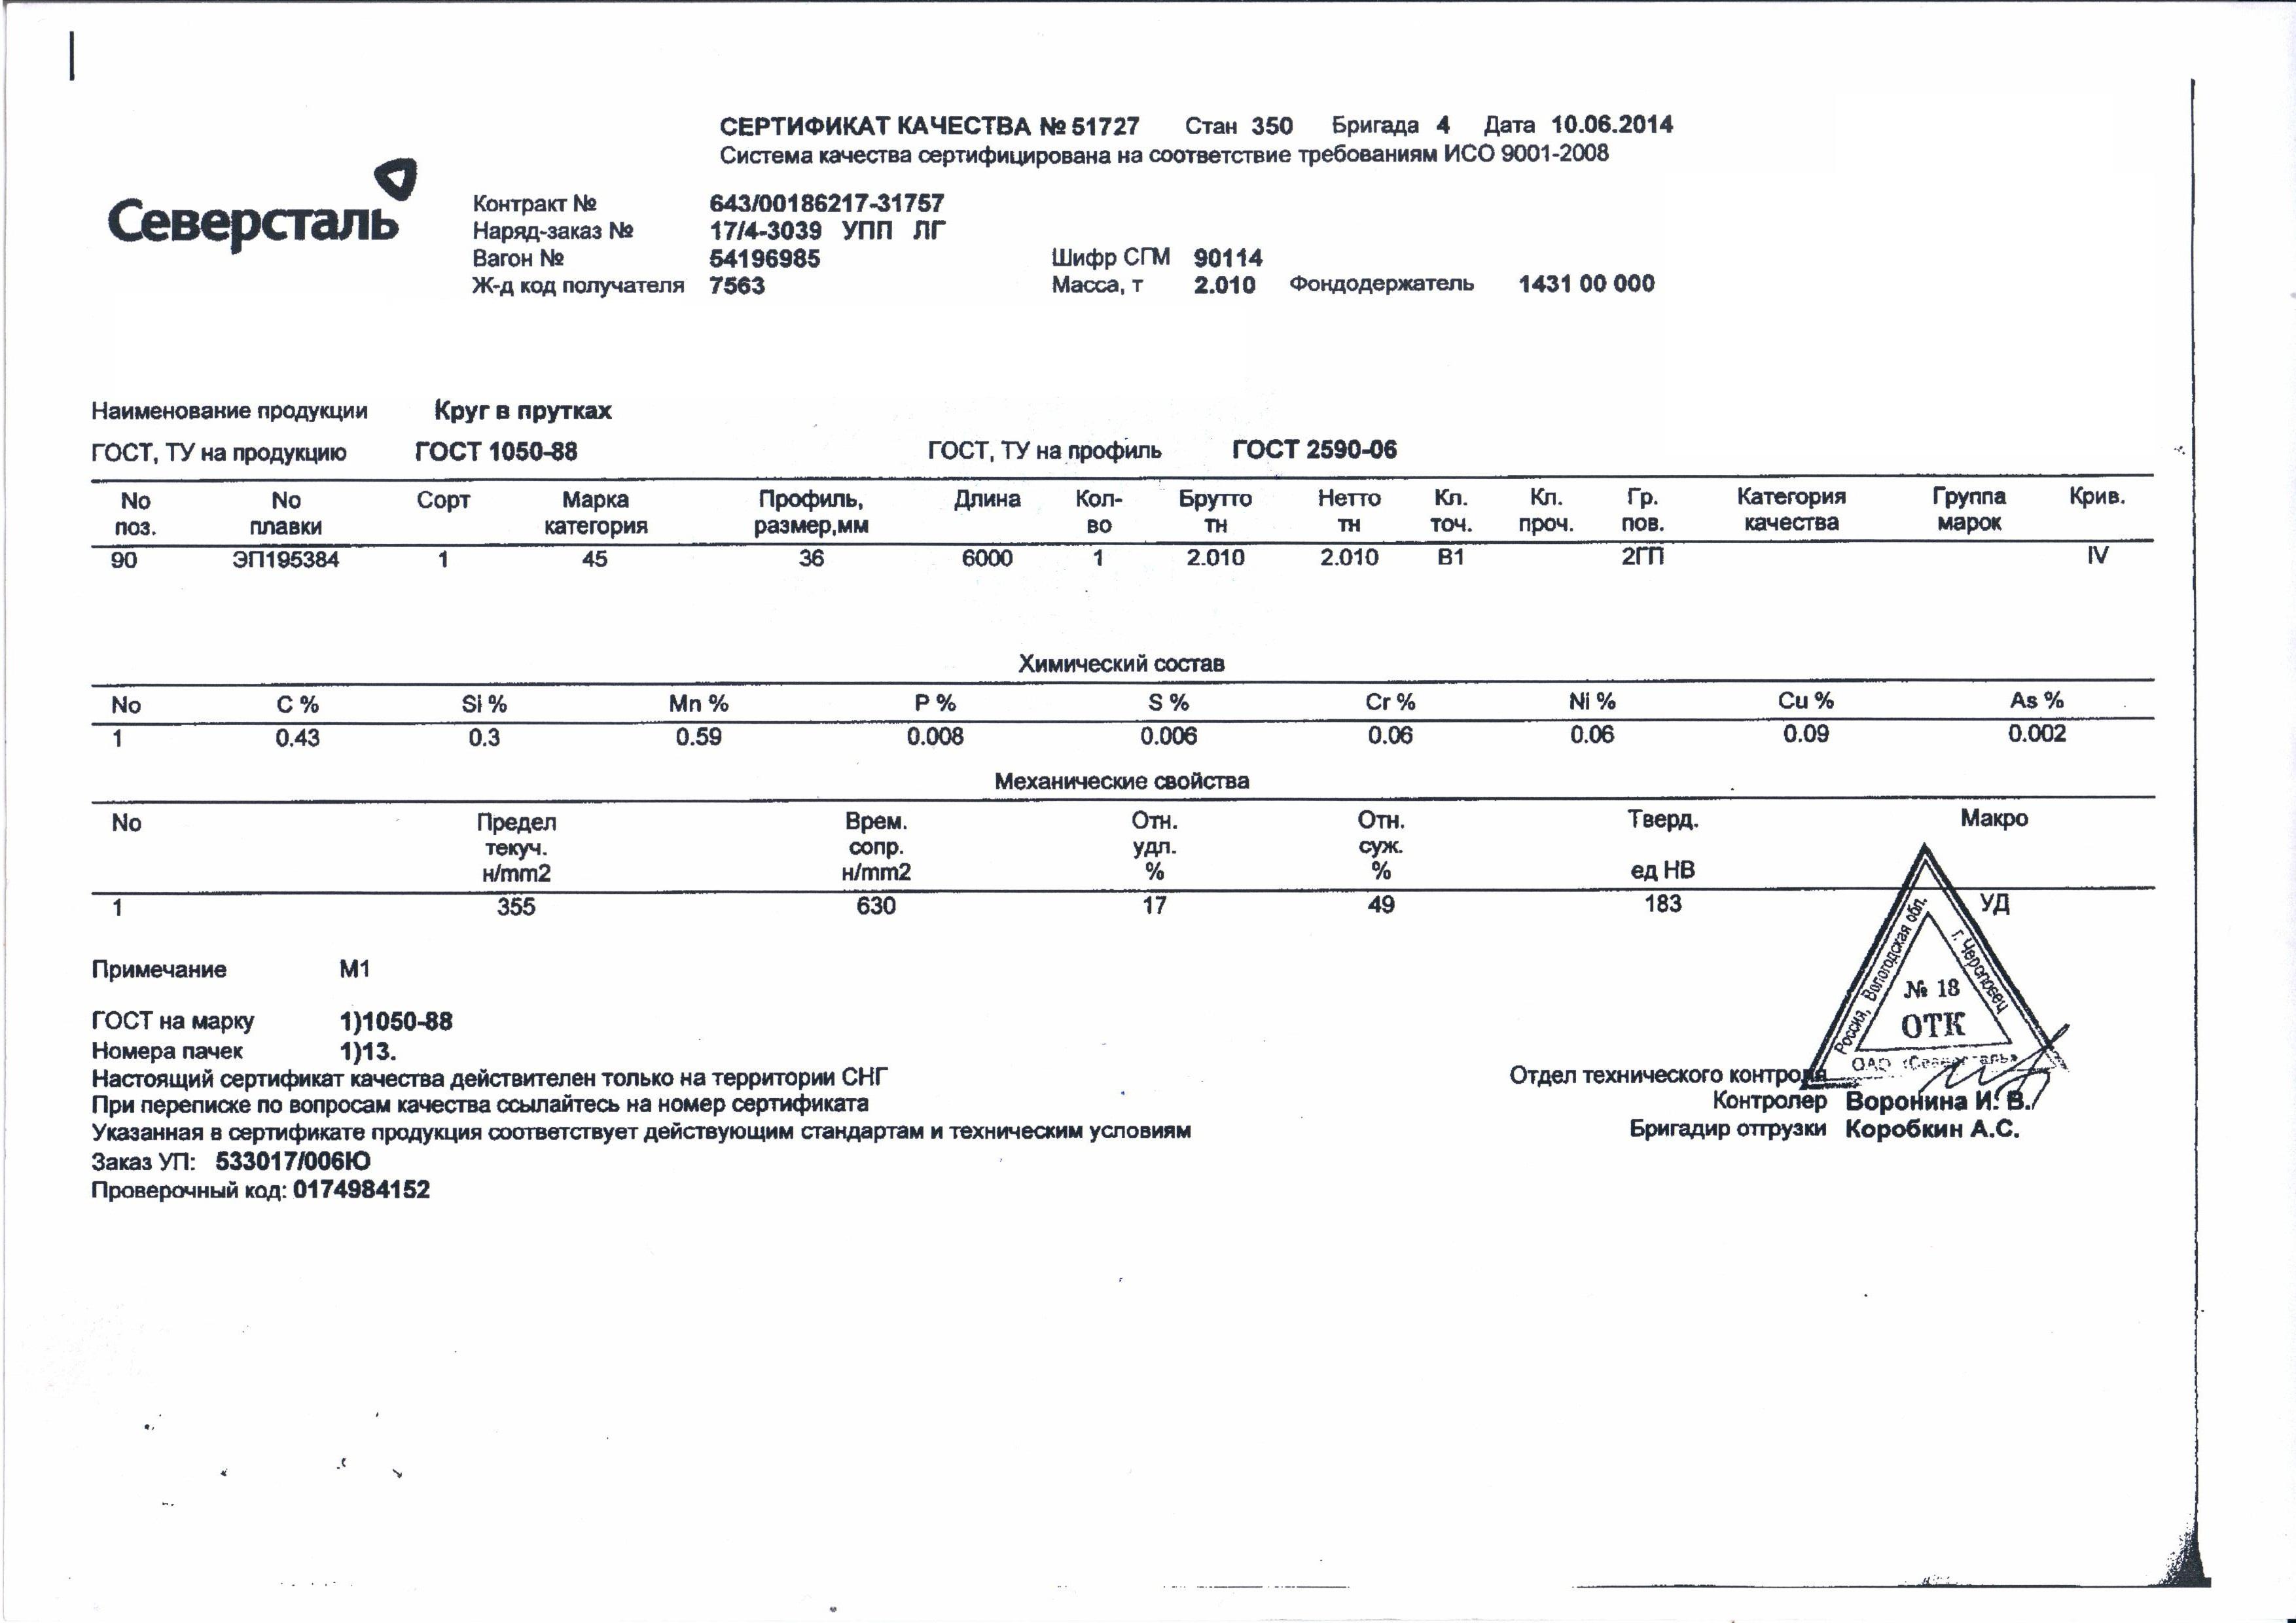 сертификаты соответствия арматуру а111